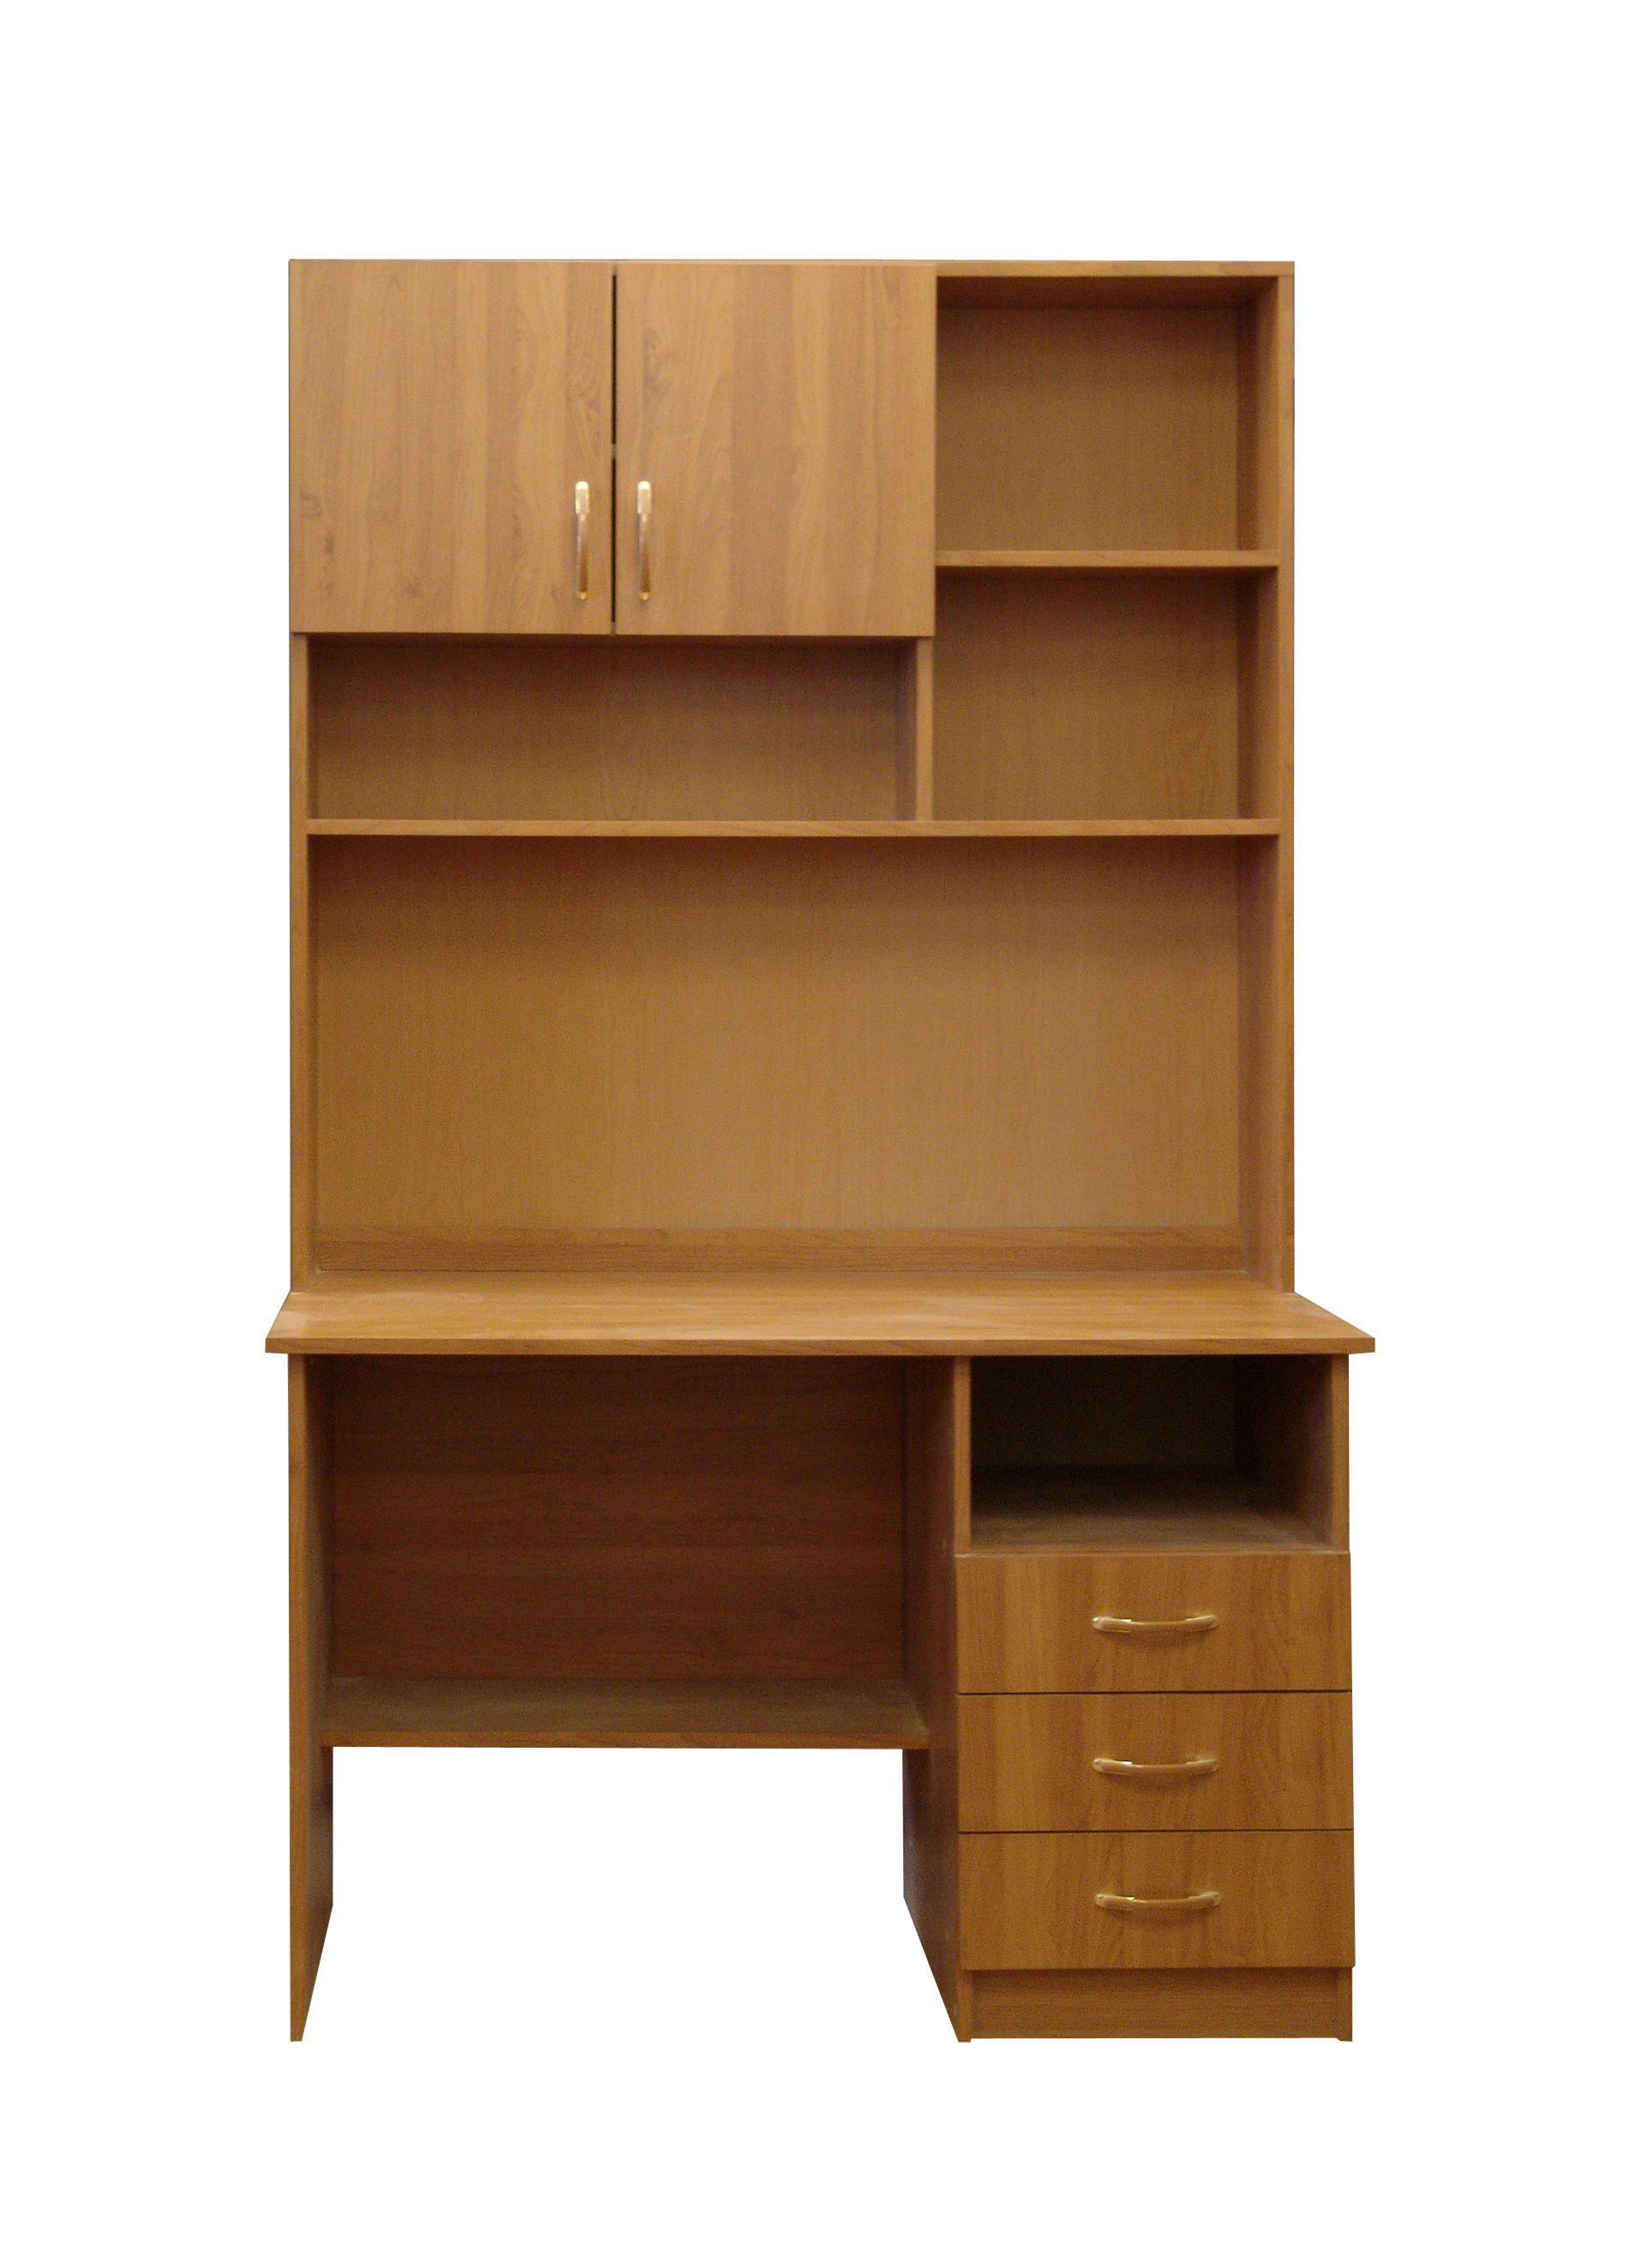 Письменный стол-стенка Елена-1 письменный стол васко соло 021